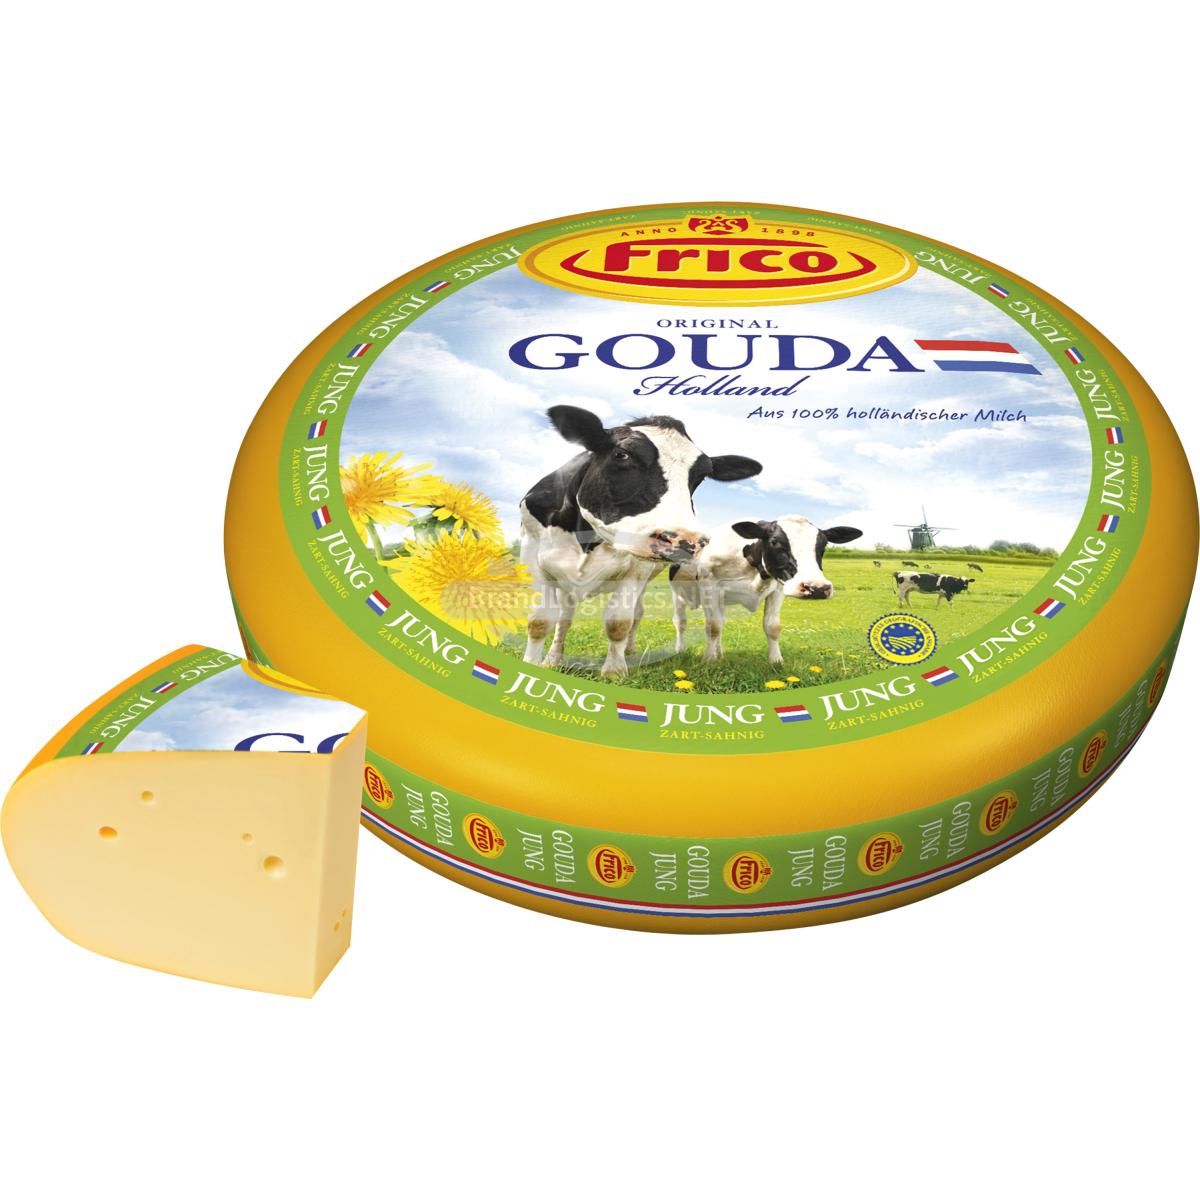 Frico Gouda jung 48% Fett 0,49€/100g @EdekaSüdwest // Frico Maasdammer 45% Fett 0,54€/100g @Kaufland